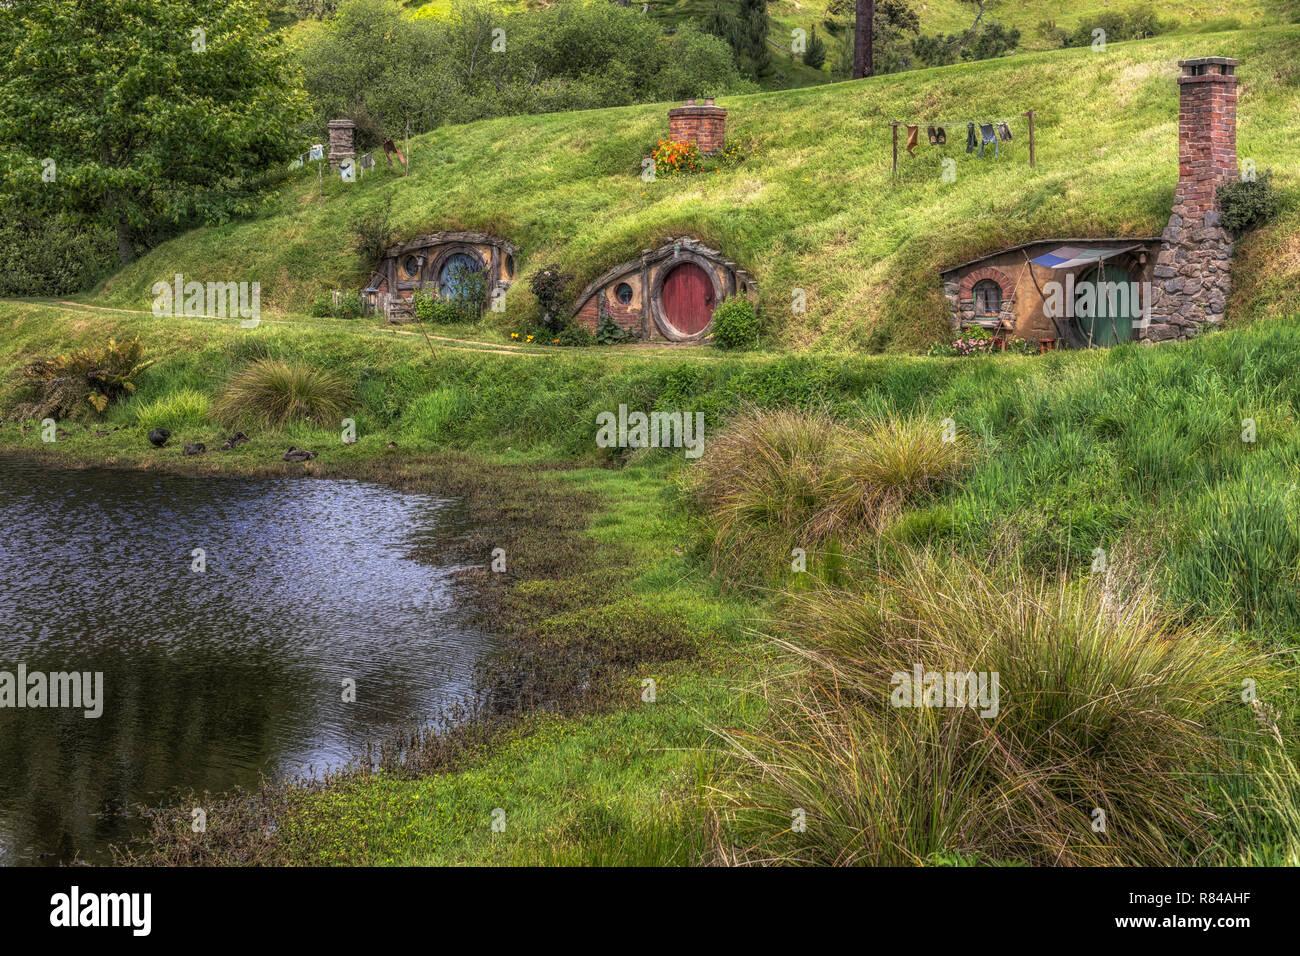 Hobbiton, Movie Set, Waikato, Matamata, New Zealand - Stock Image